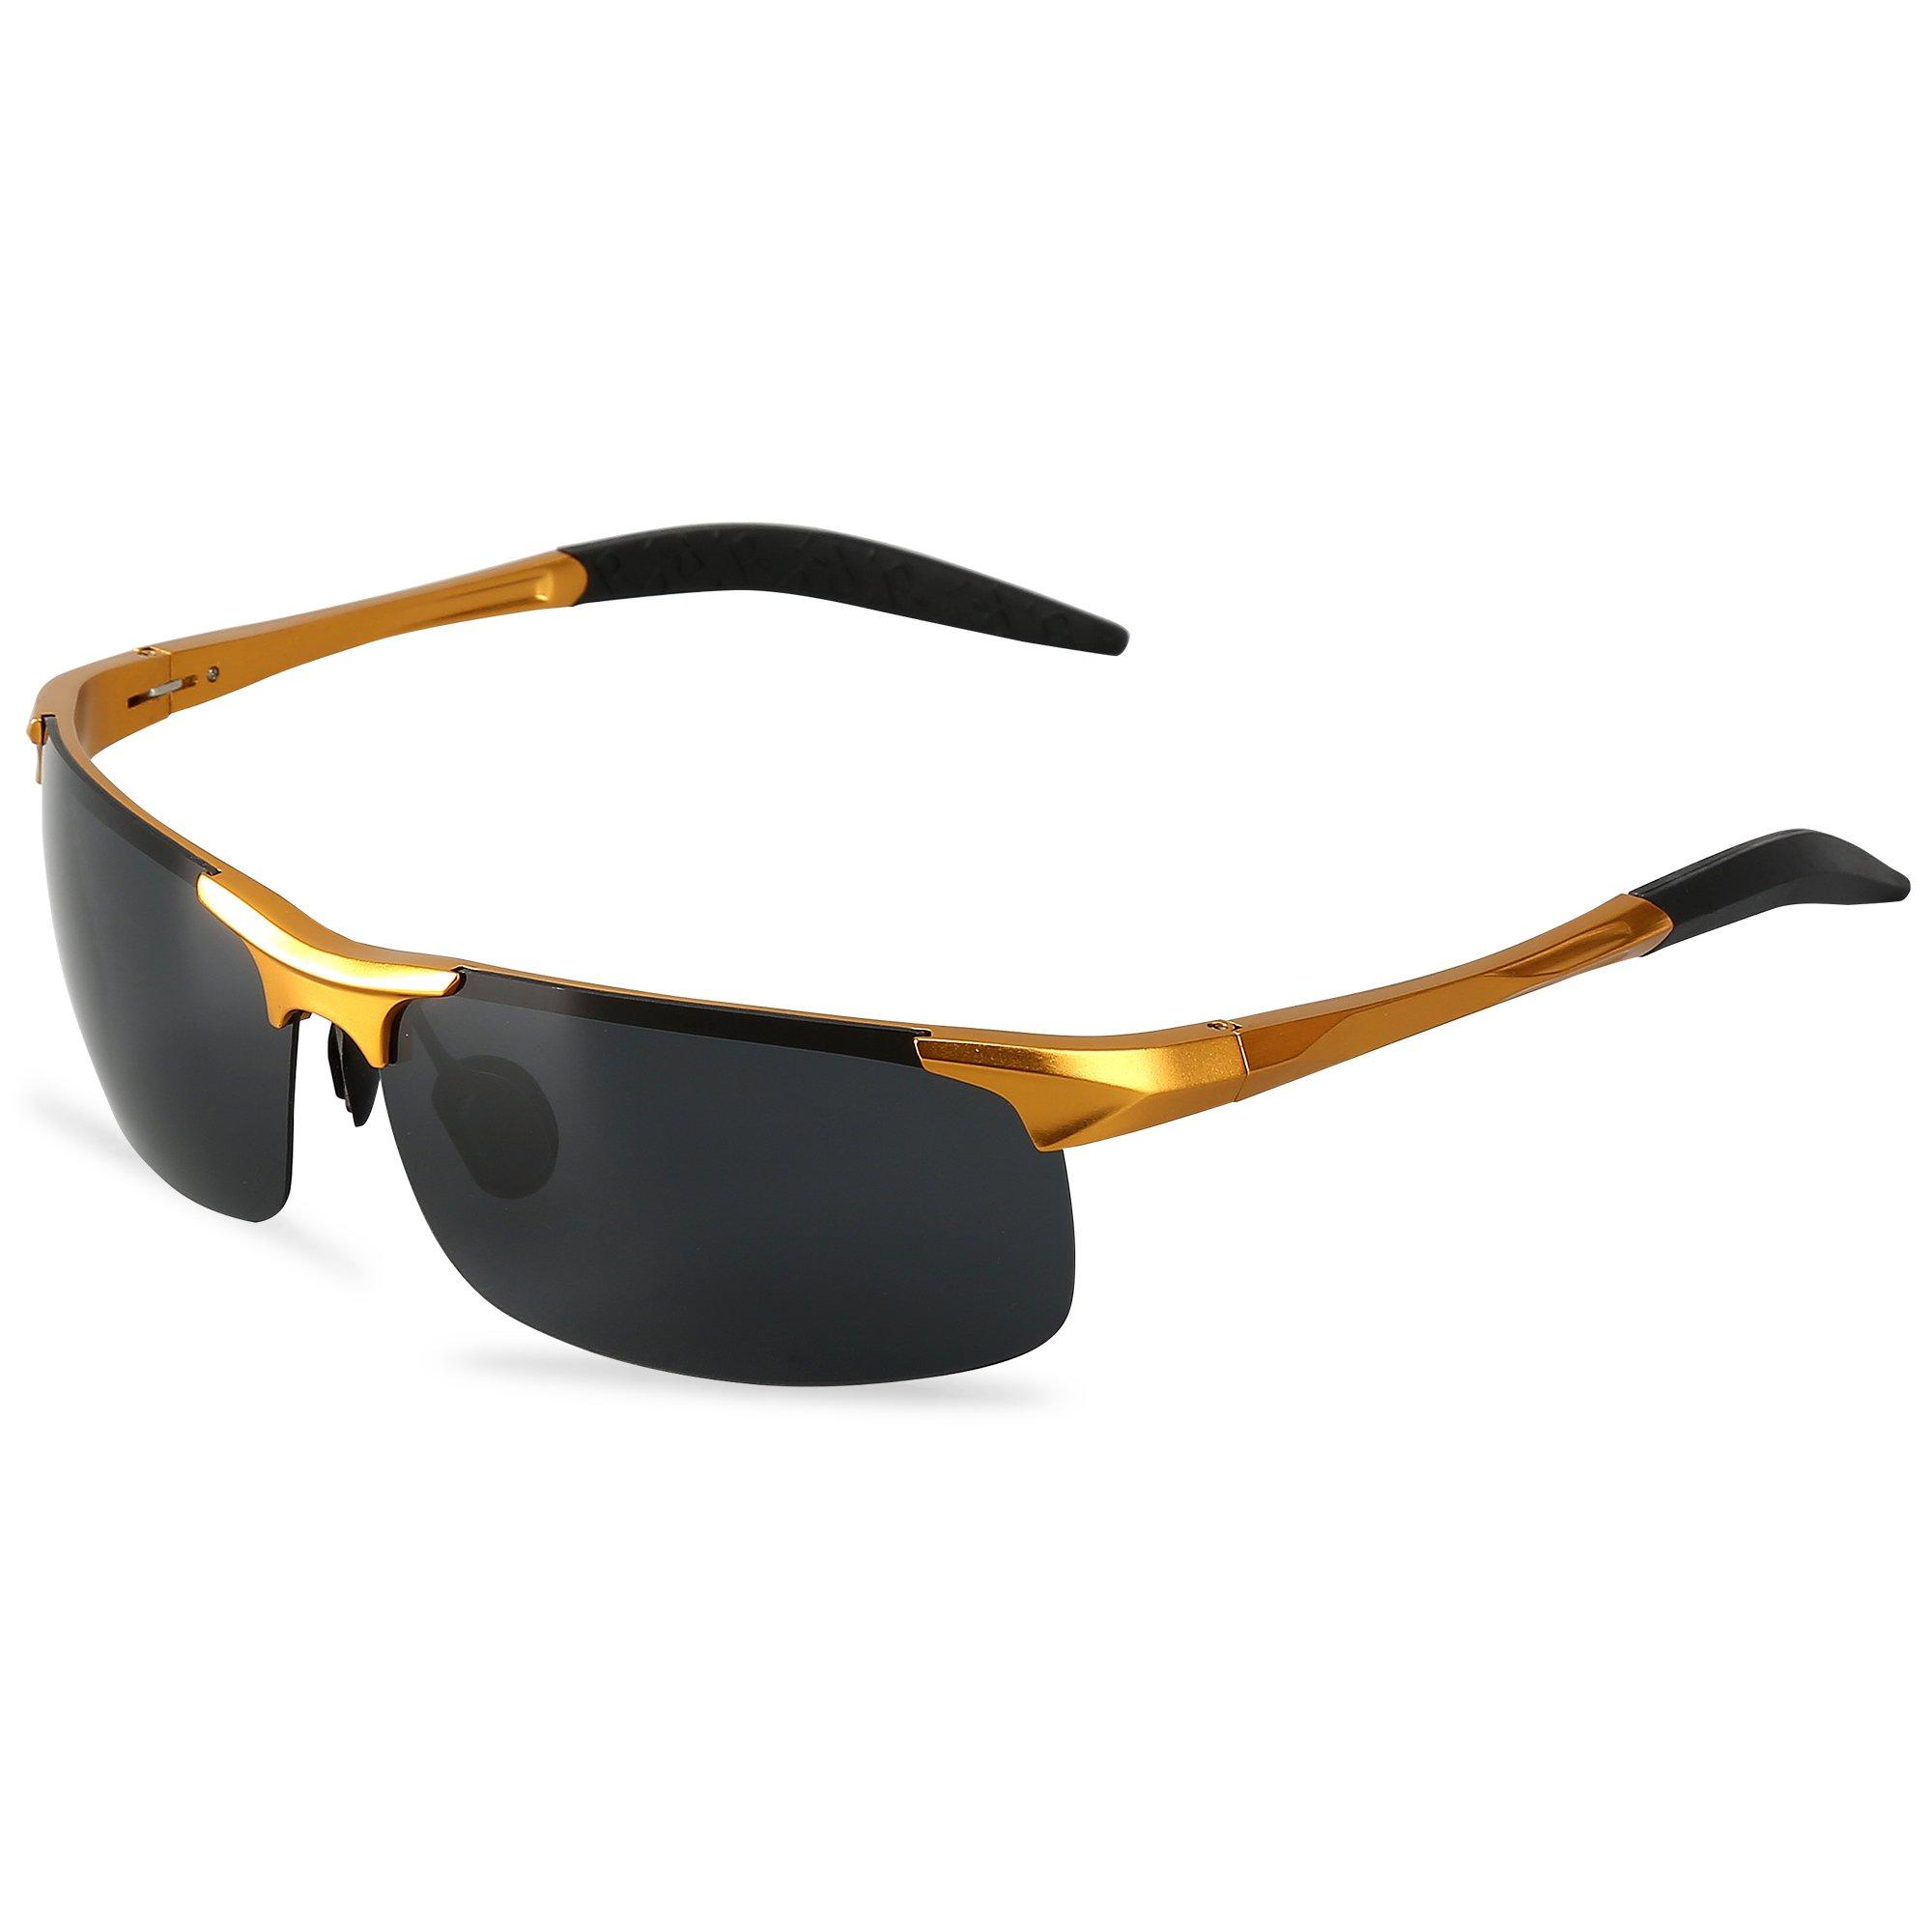 3a8ae15b5f56 Men s Sports Style Polarized Sunglasses For Driving Fishing Cycling  Ultralight Glasses LeadallwayTM (Golden frame darkgrey lens)